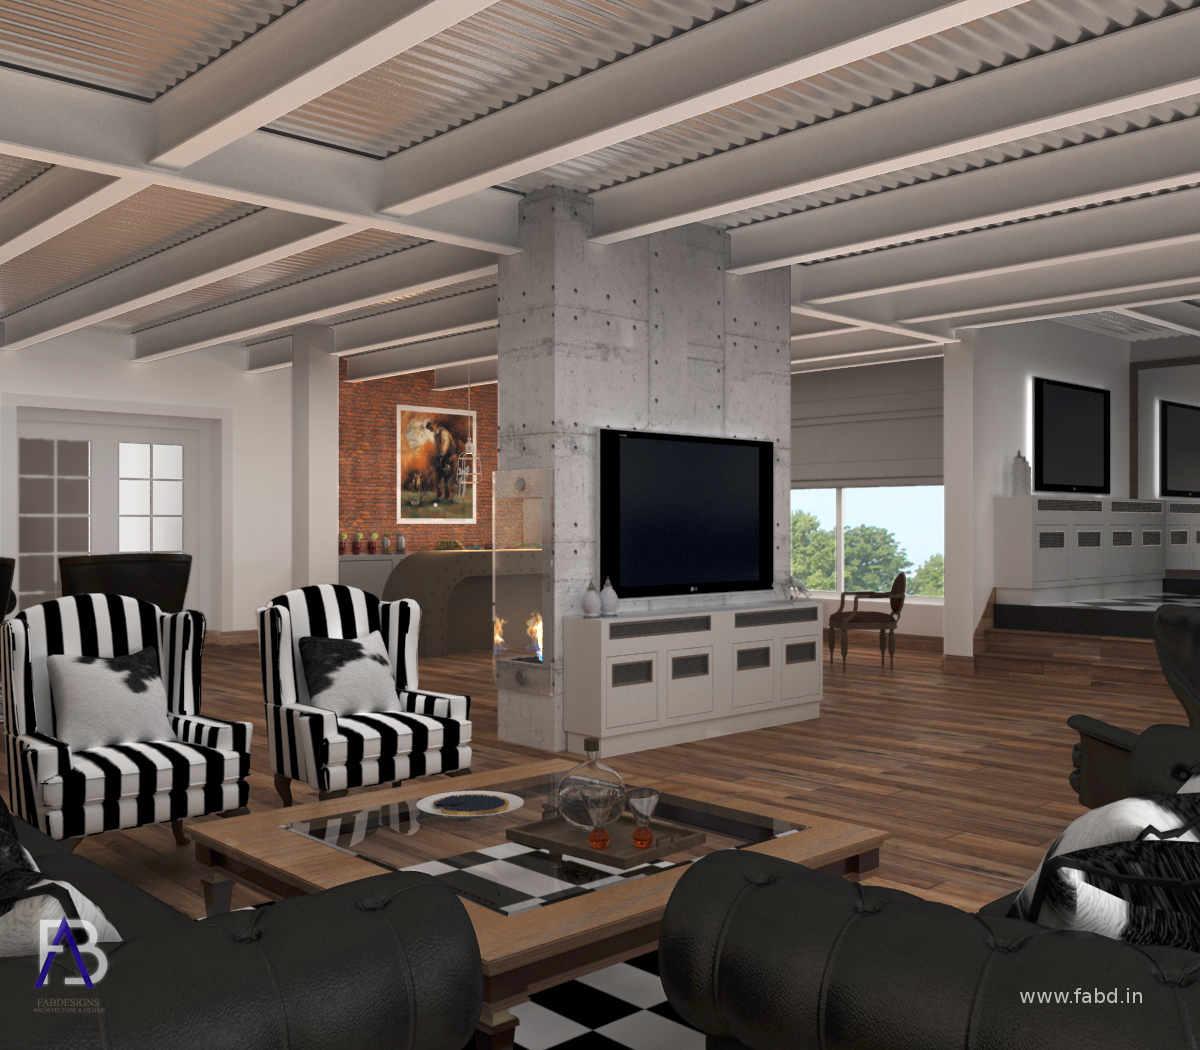 Lounge Area Interior Rendering